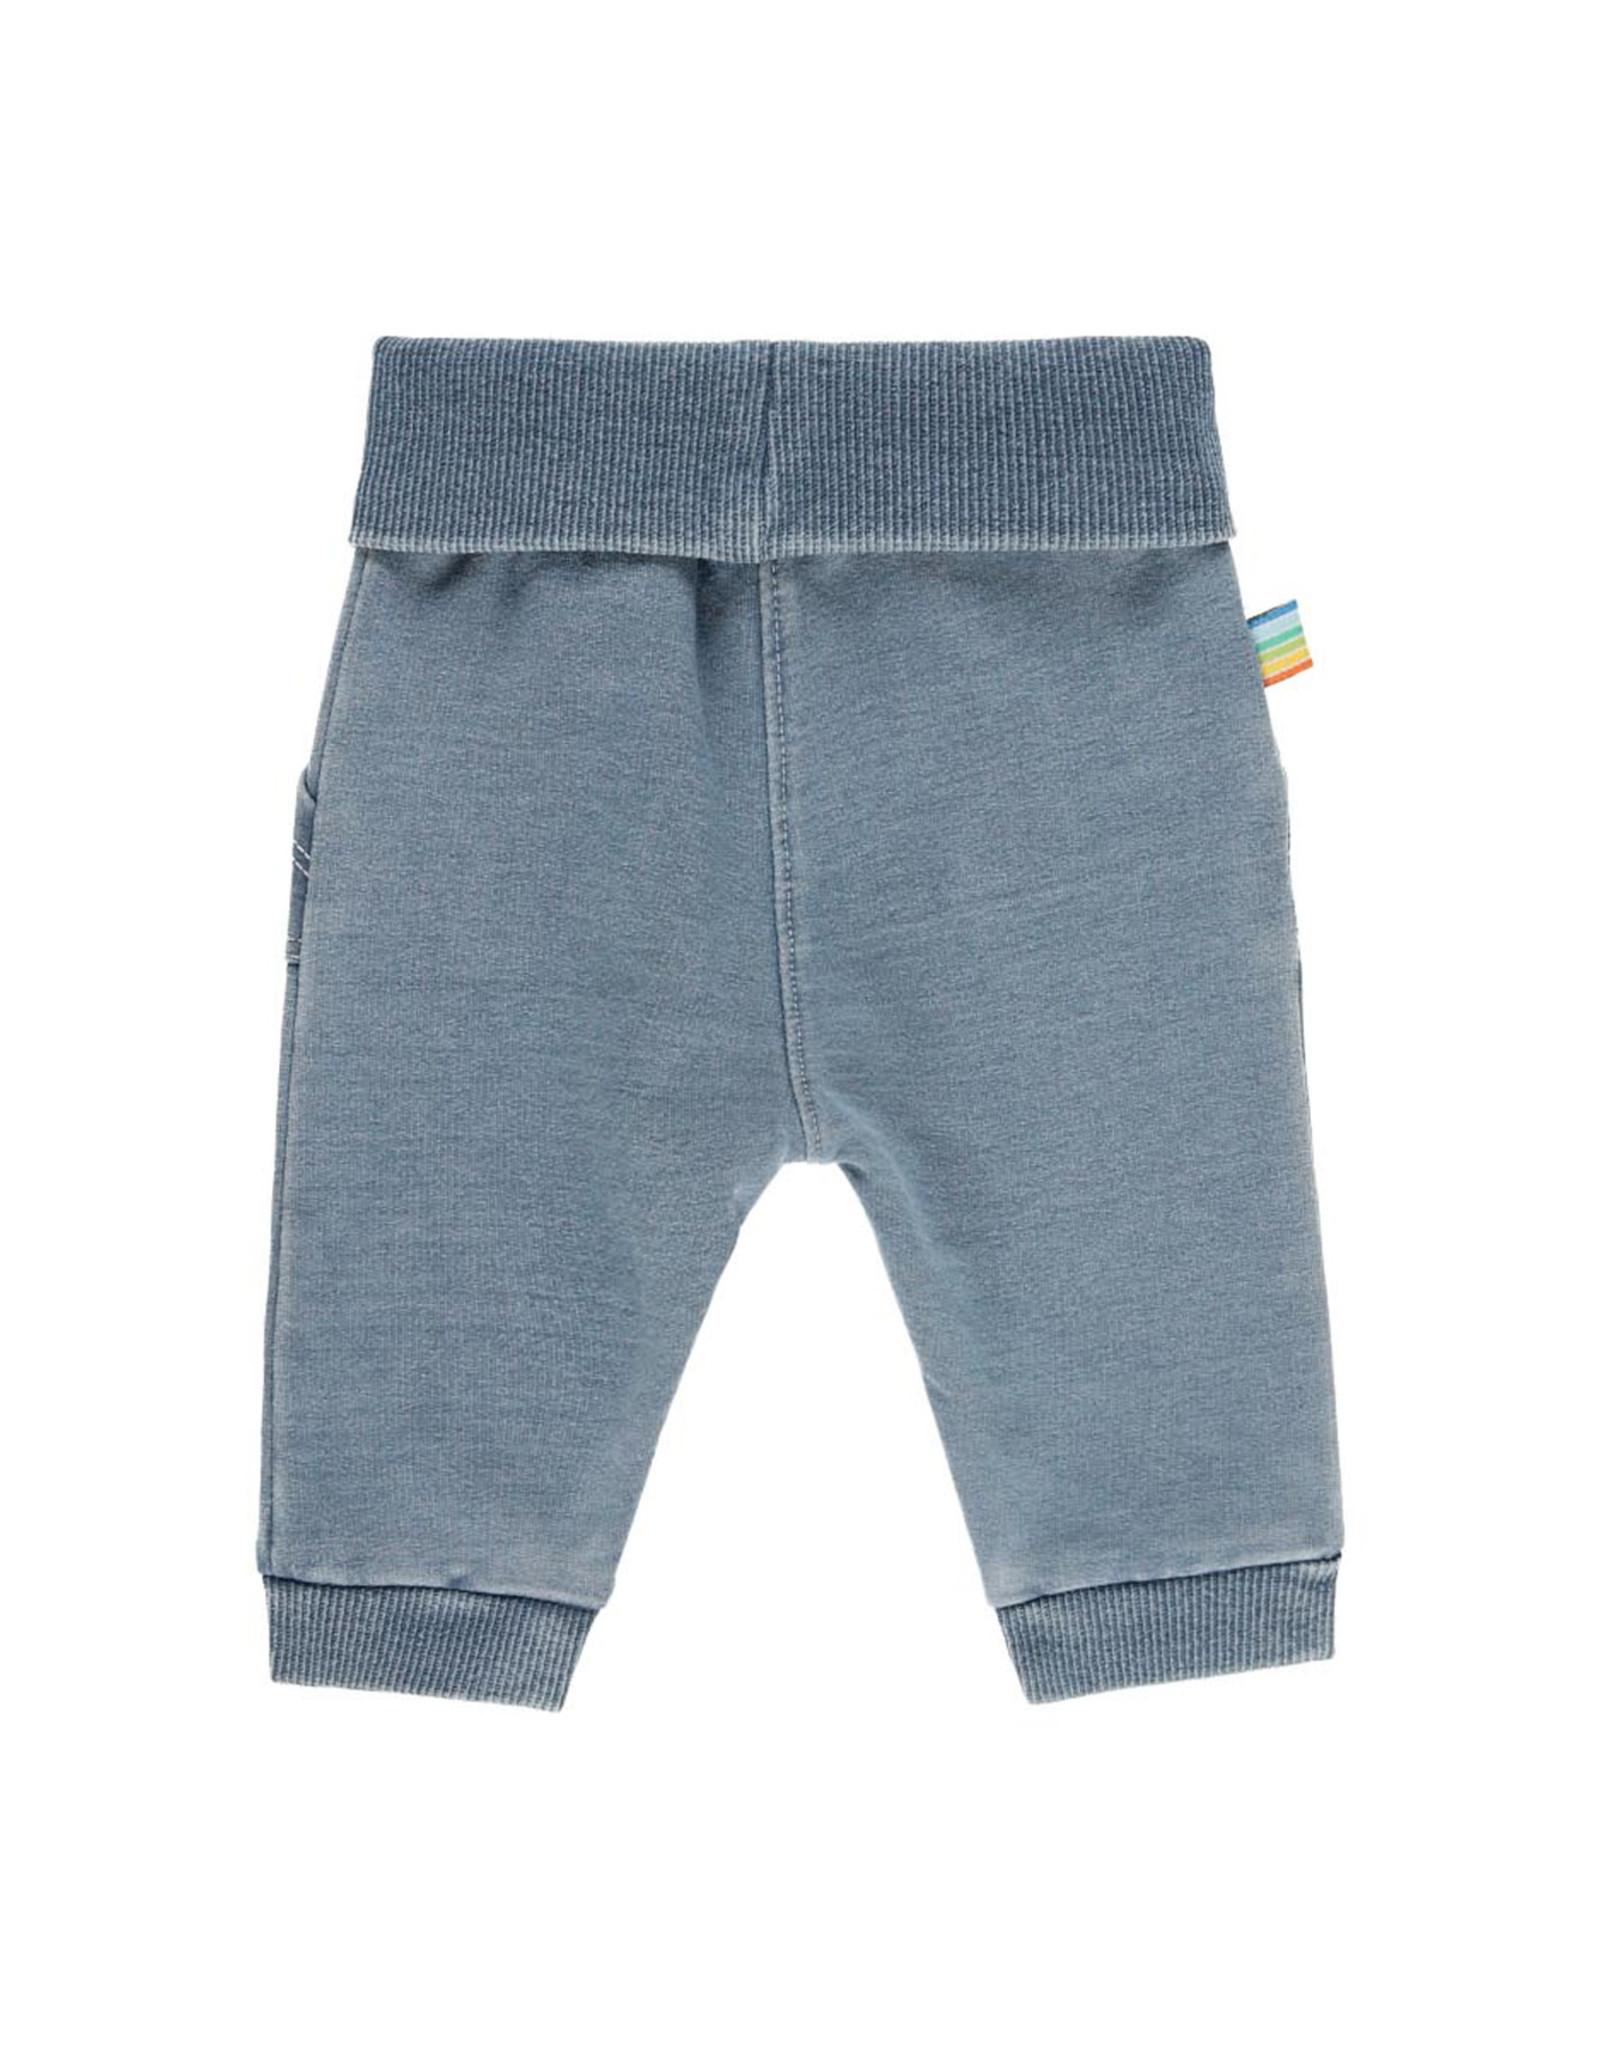 Boboli Denim Trousers